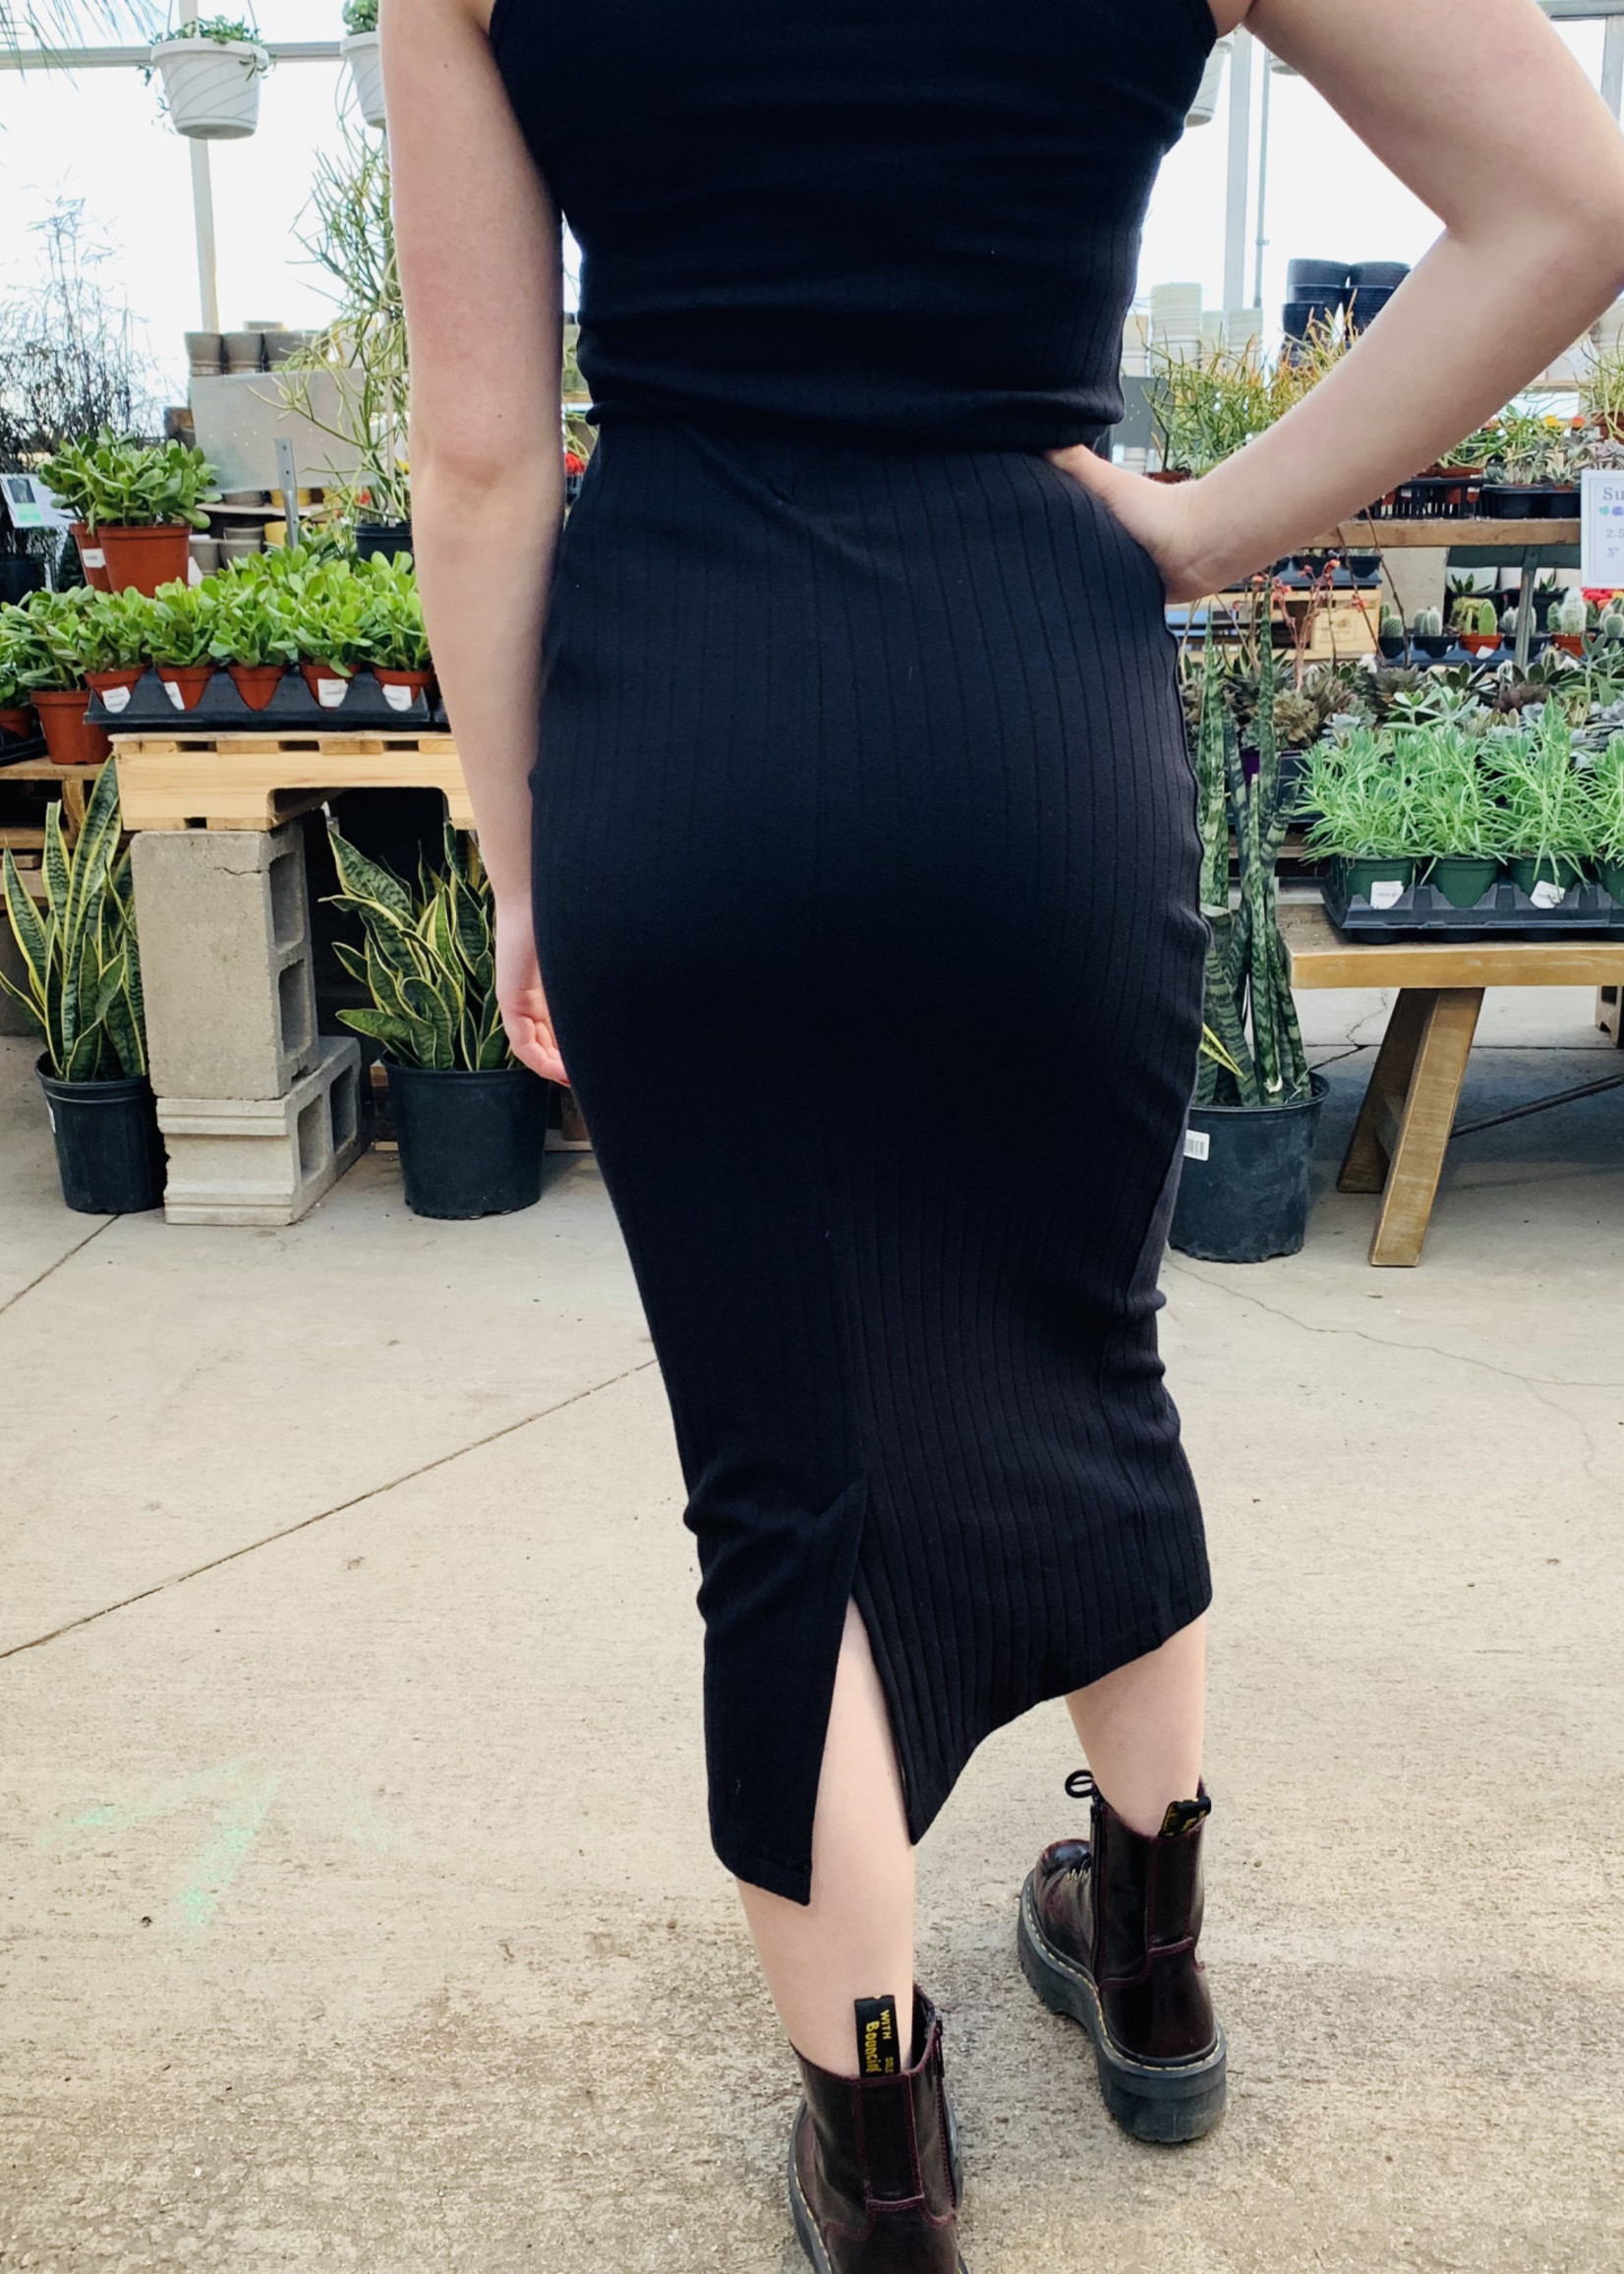 LeBLANC finds The Josie Skirt